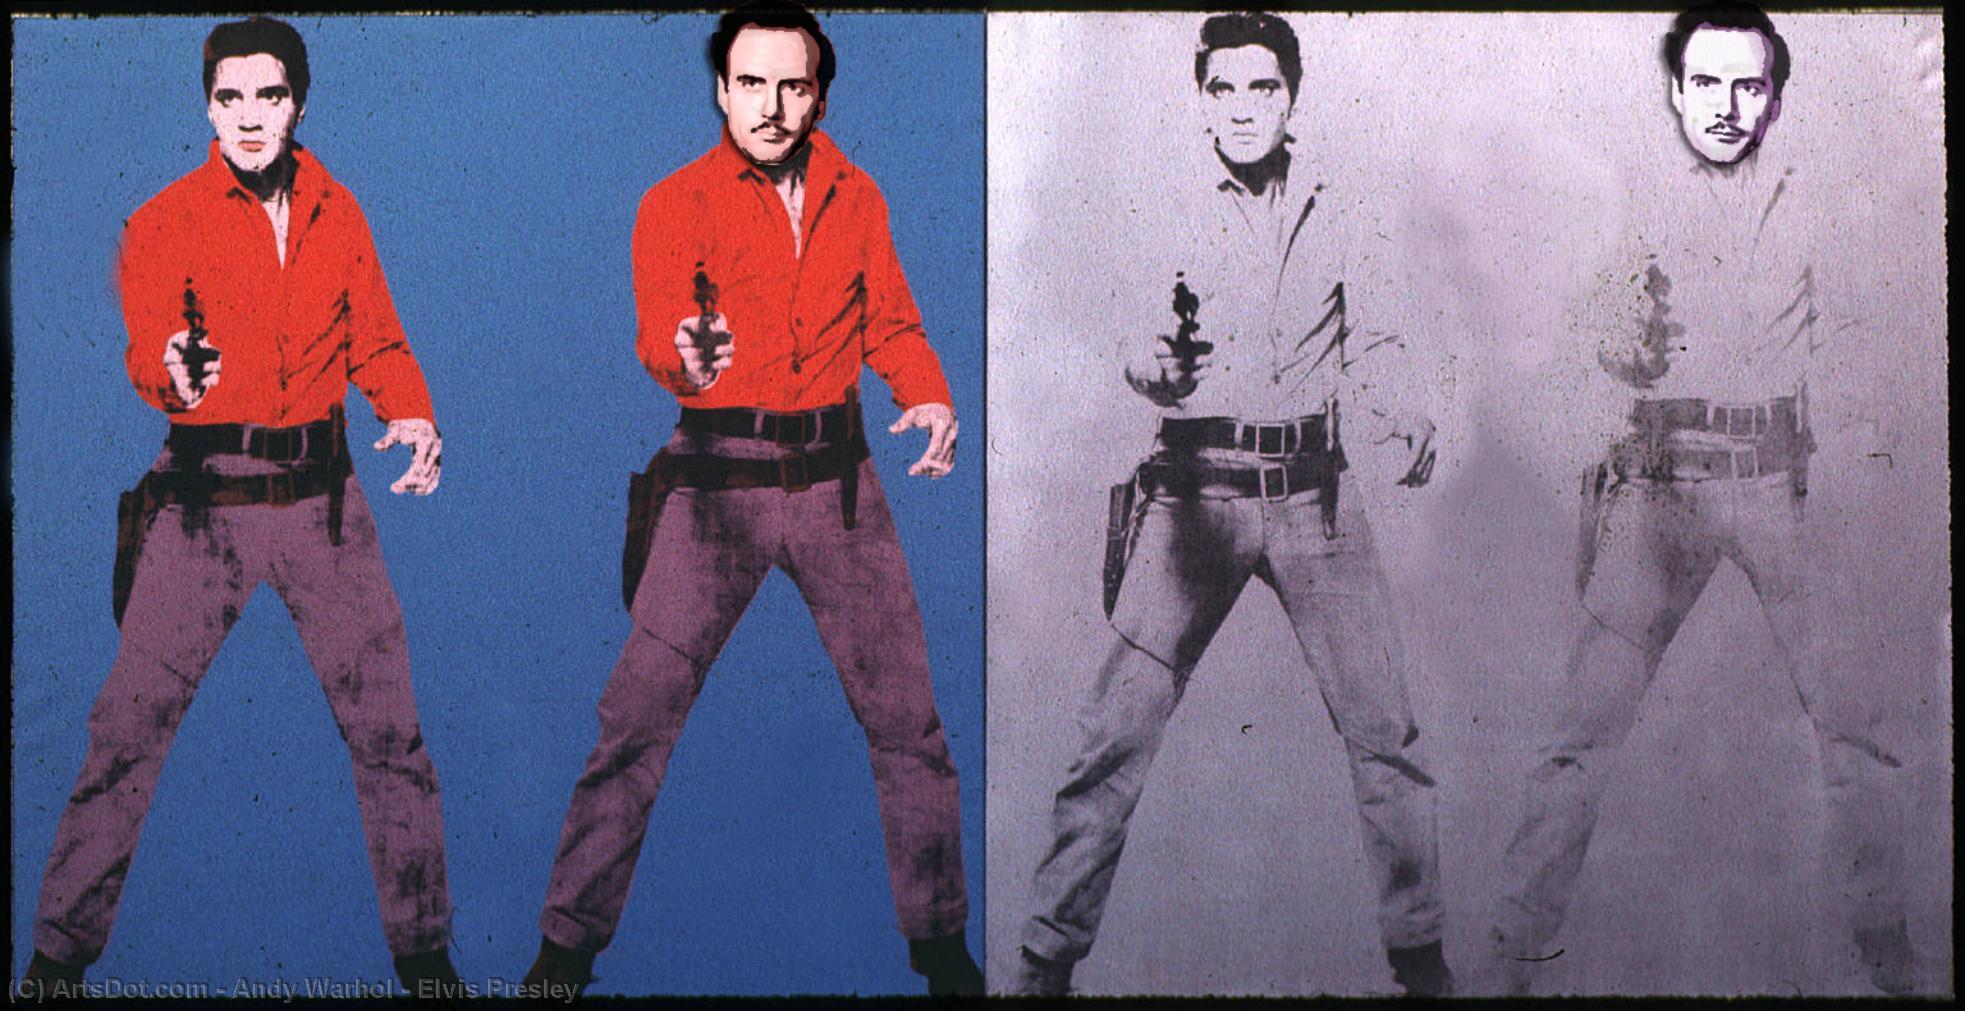 Wikioo.org - The Encyclopedia of Fine Arts - Painting, Artwork by Andy Warhol - Elvis Presley